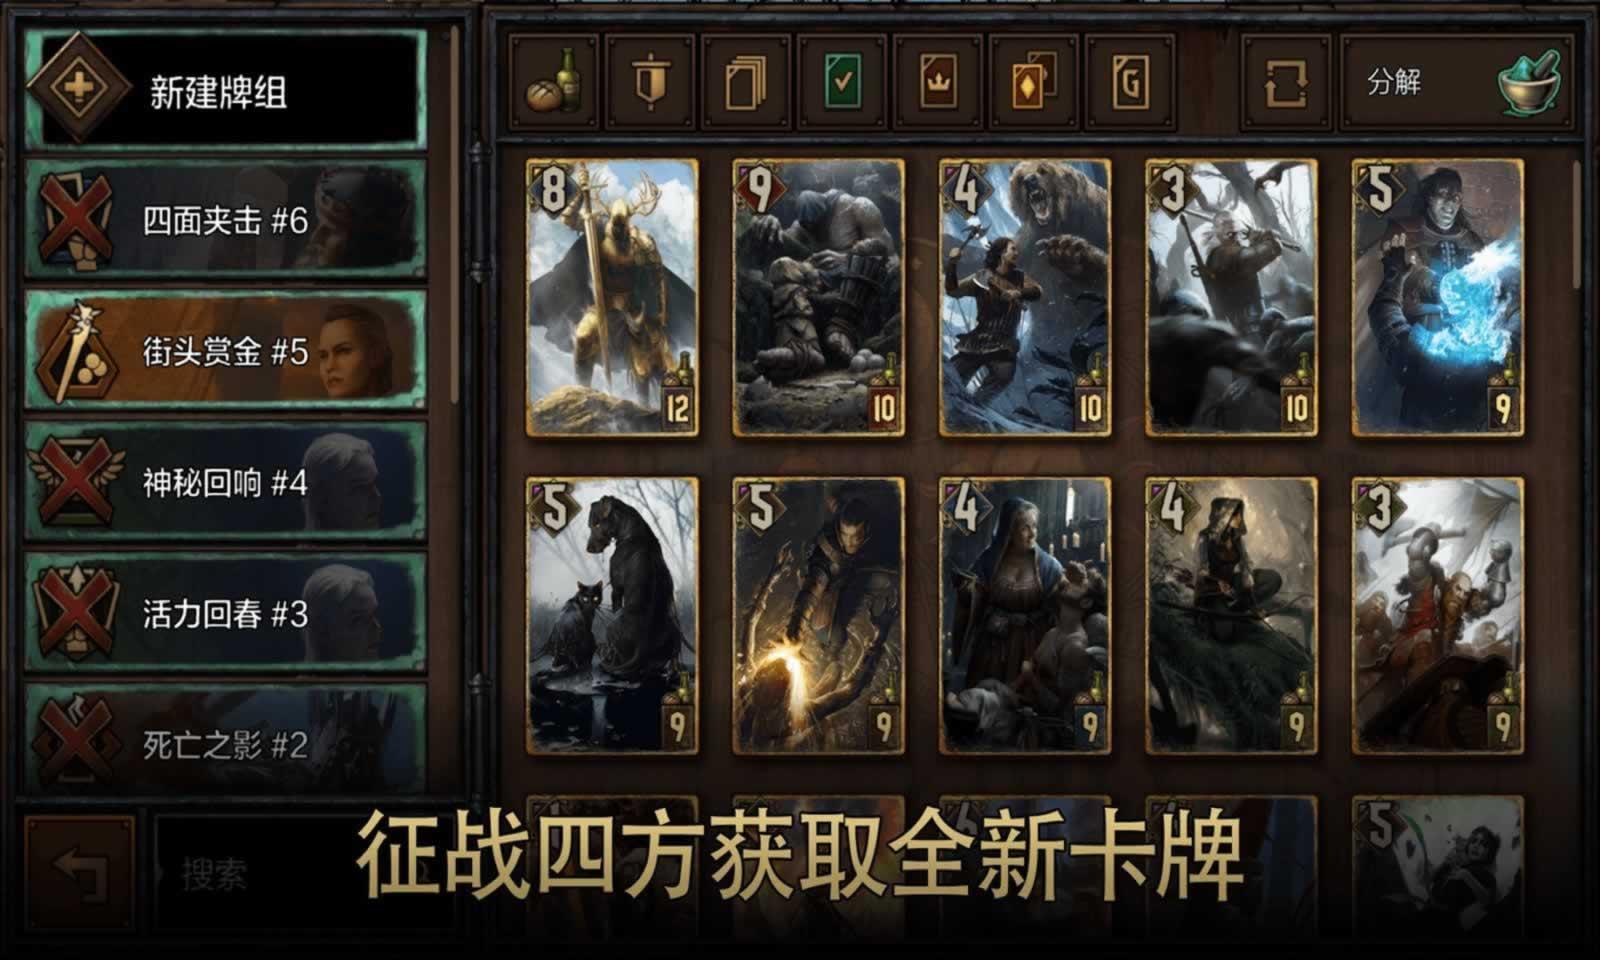 昆特牌iOS苹果版(Gwent The Witcher Card Game)图1: